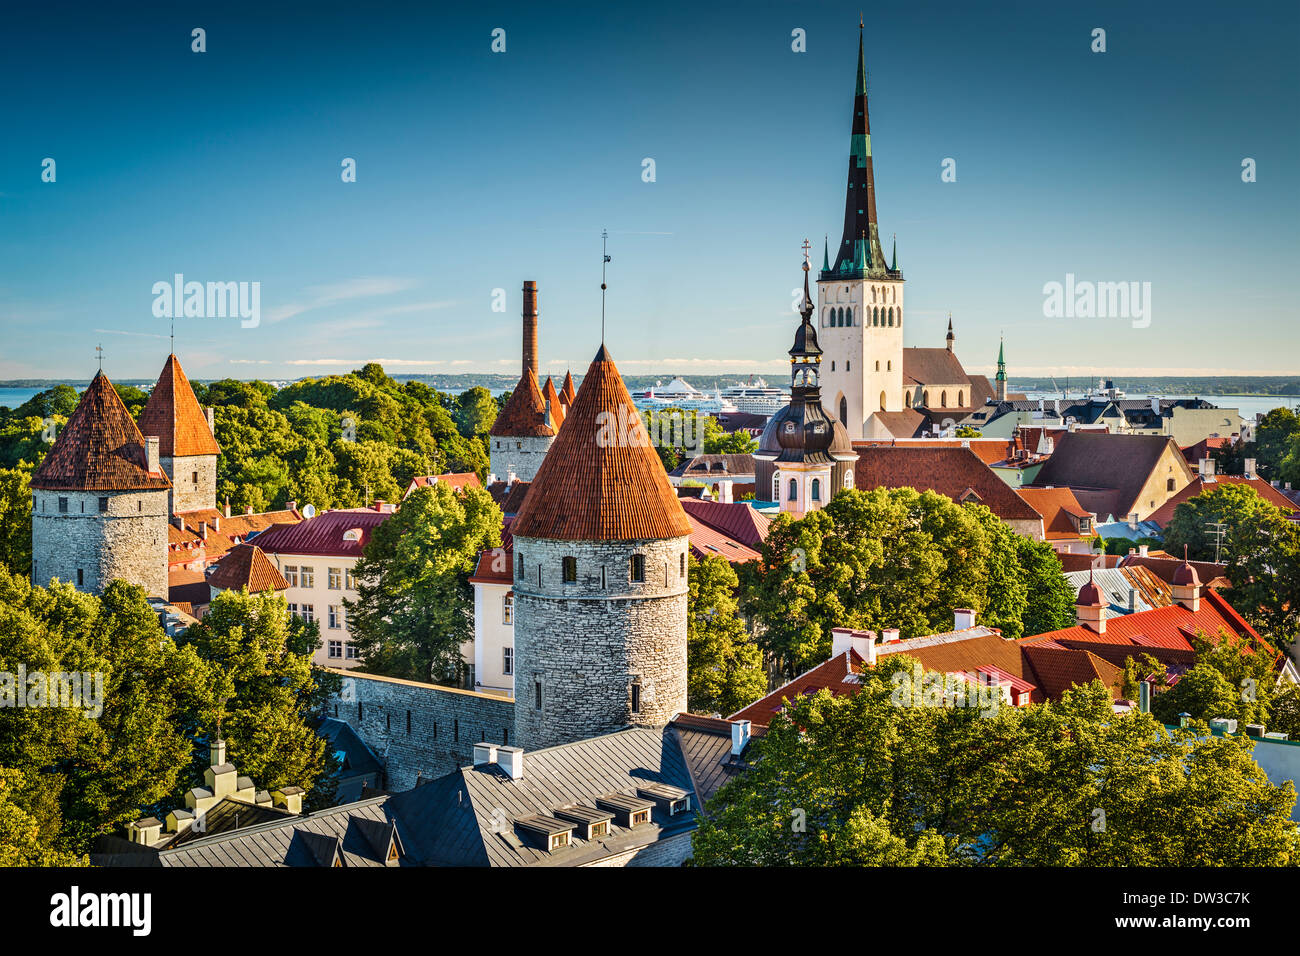 Tallinn, Estonia old city view from Toompea Hill. - Stock Image